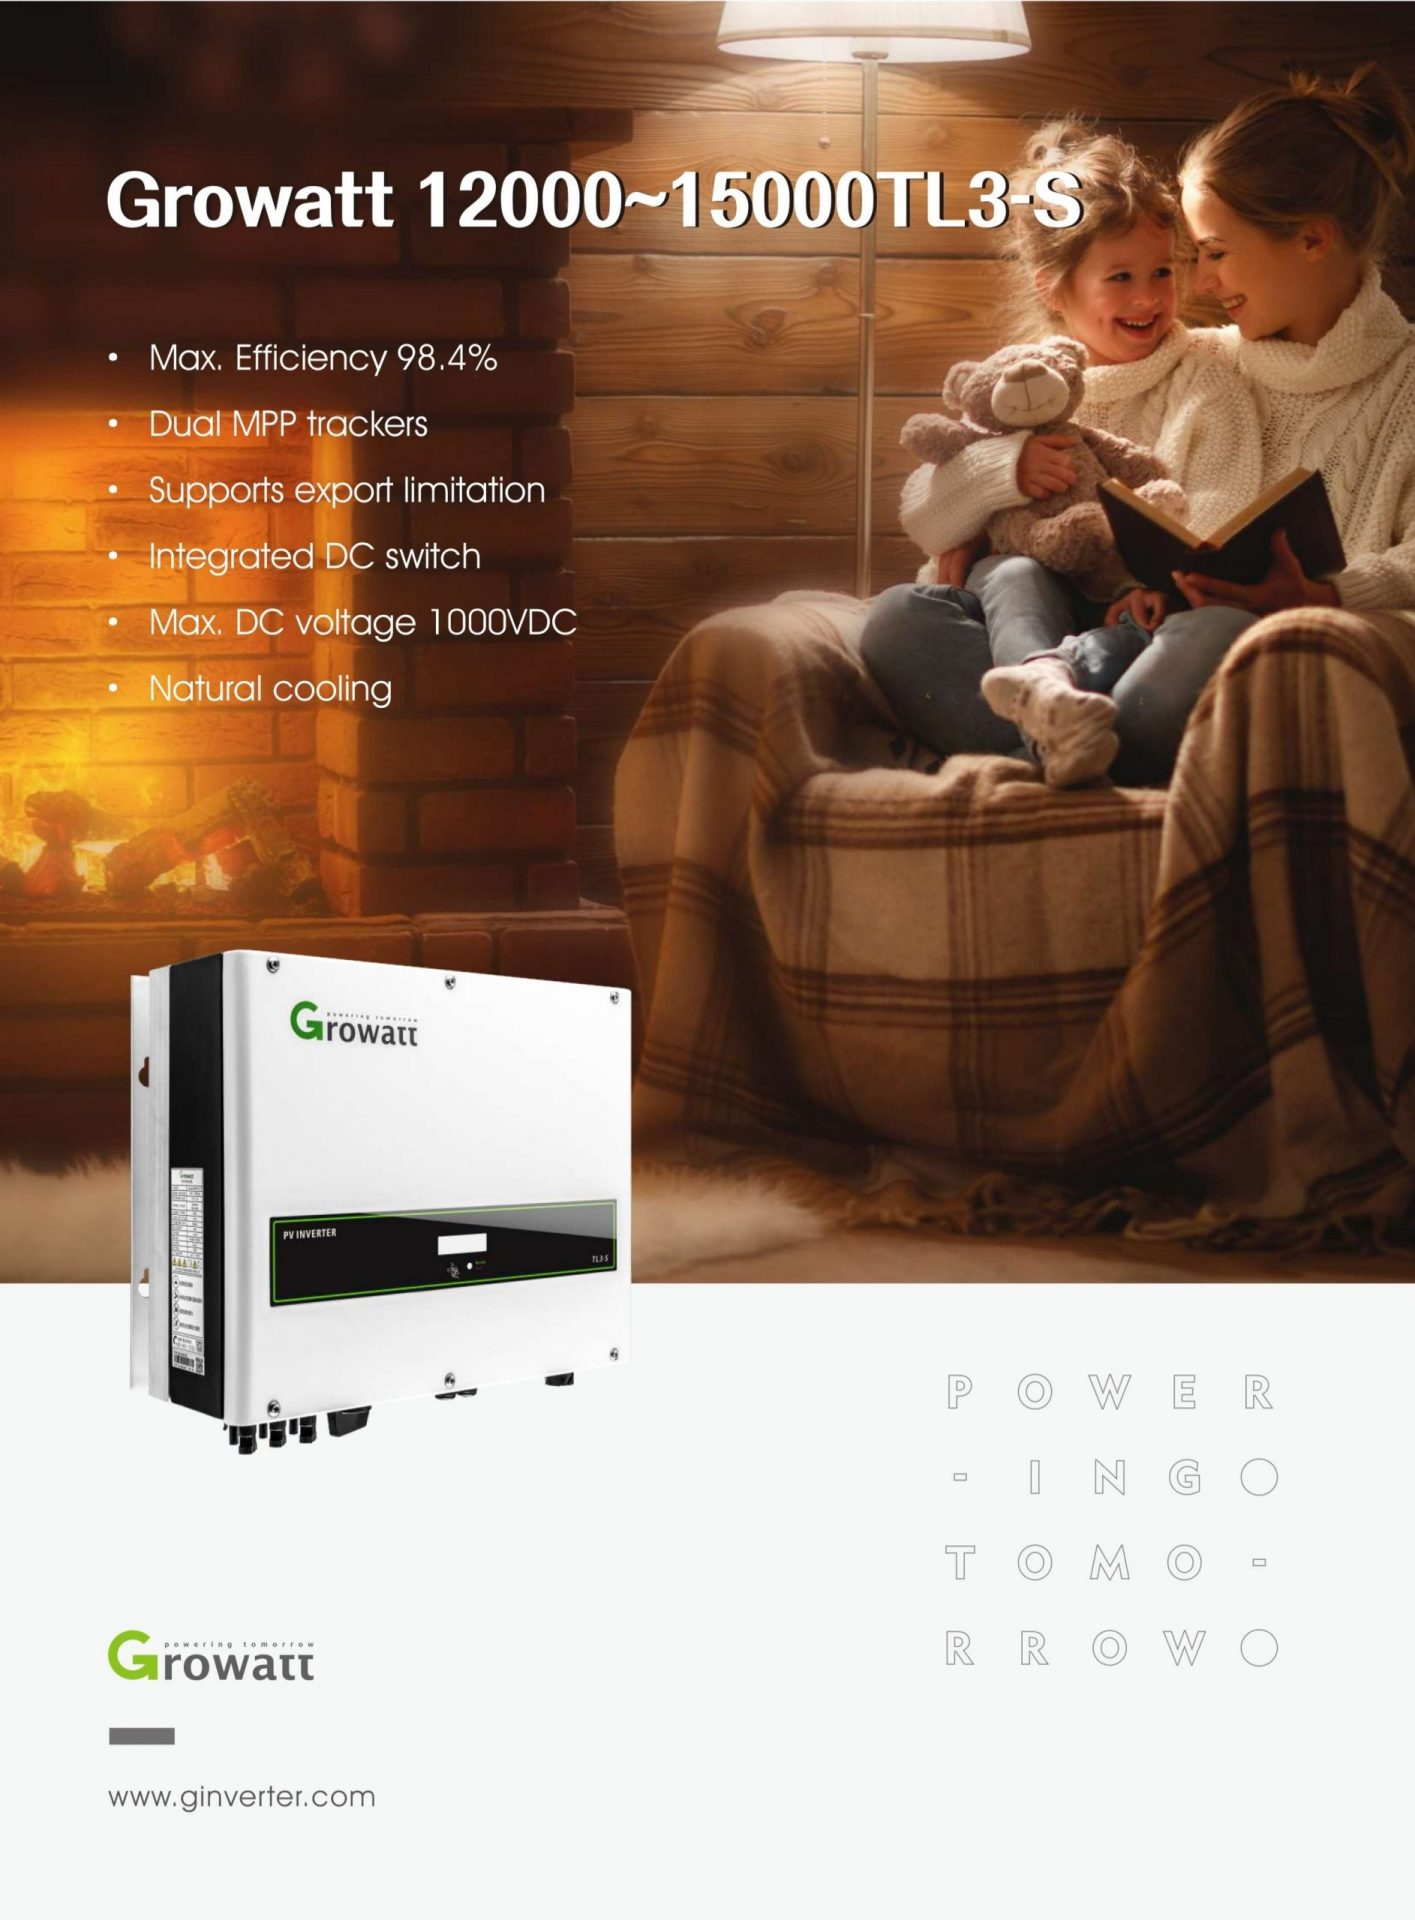 Inverter hòa lưới 3 pha Growatt 12000-15000TL3-S